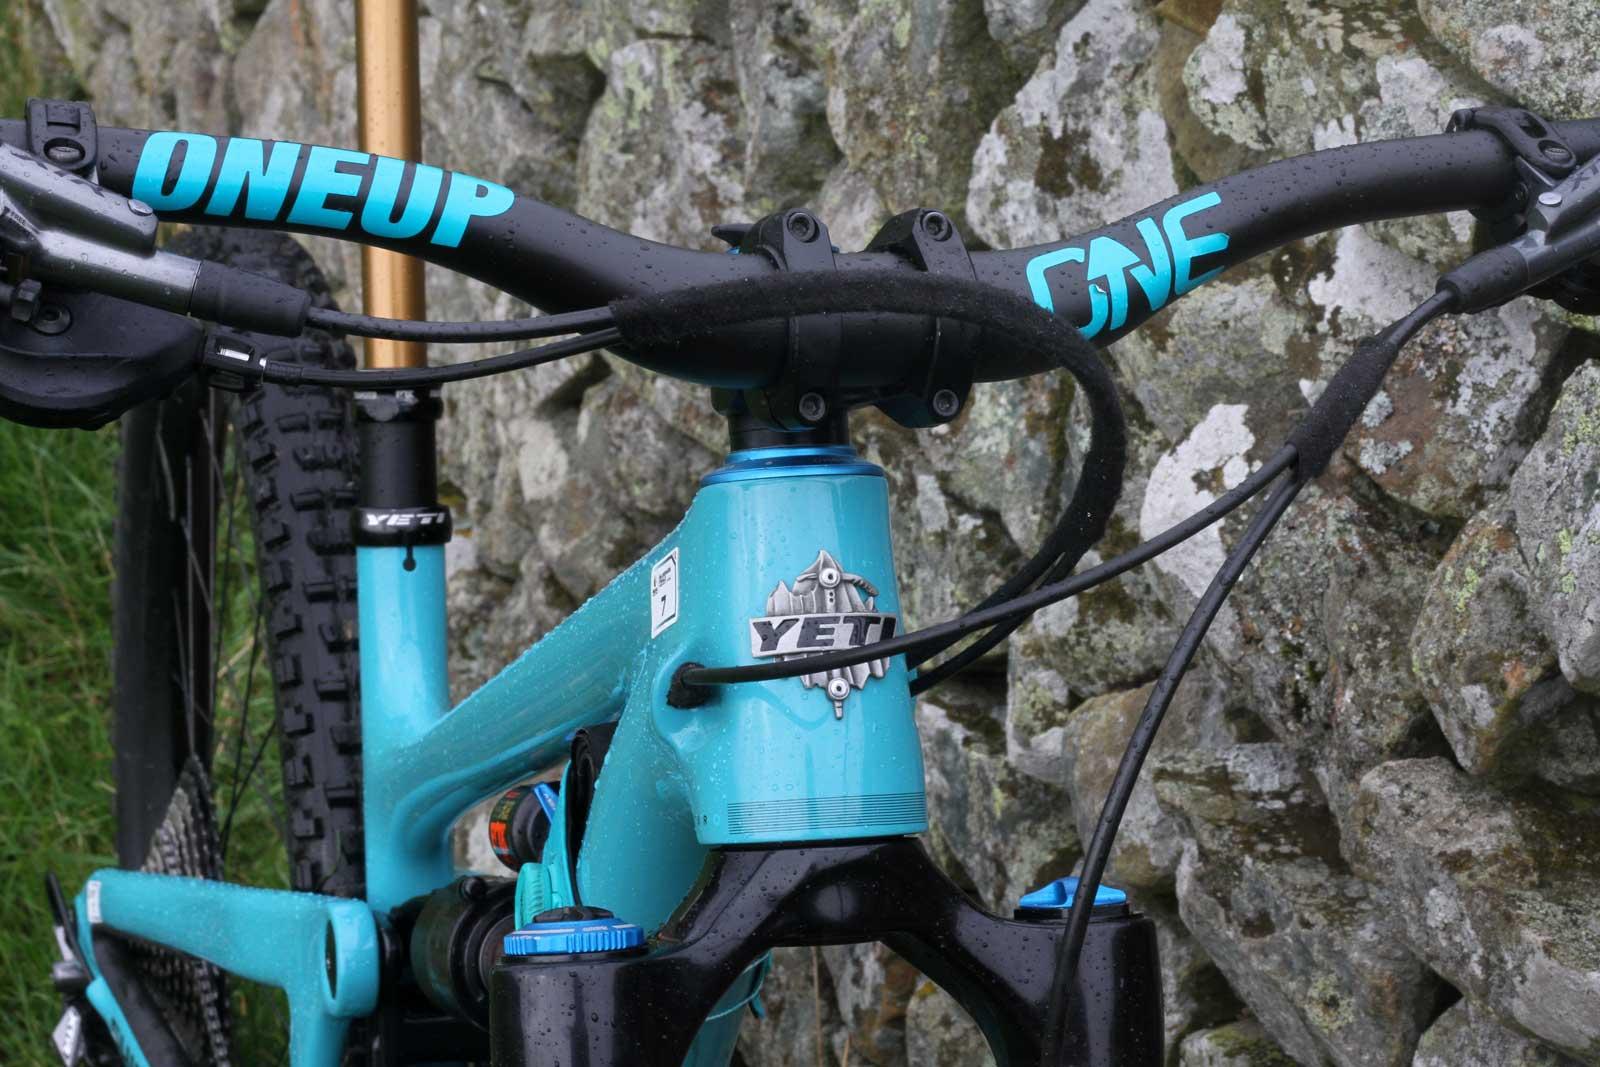 richie rude yeti sb150 pro bike check cockpit components